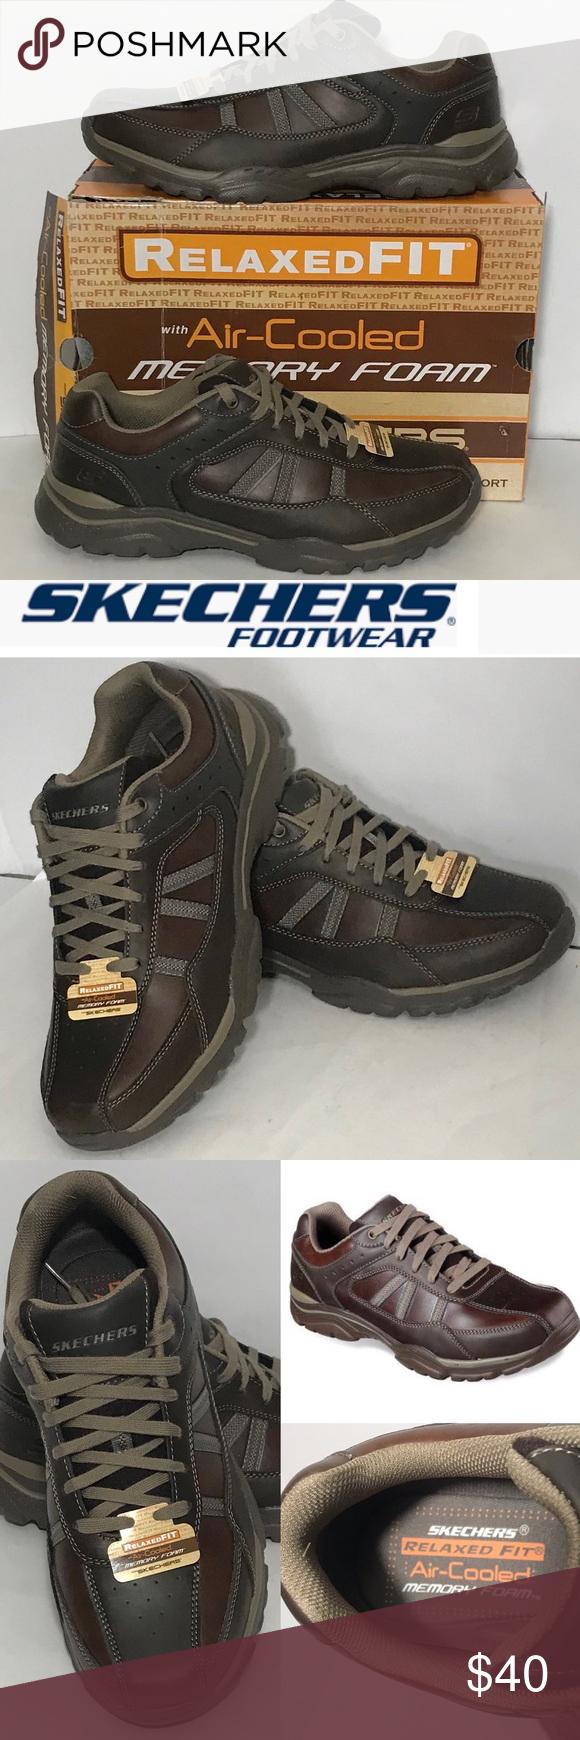 men's skechers shoes leather upper